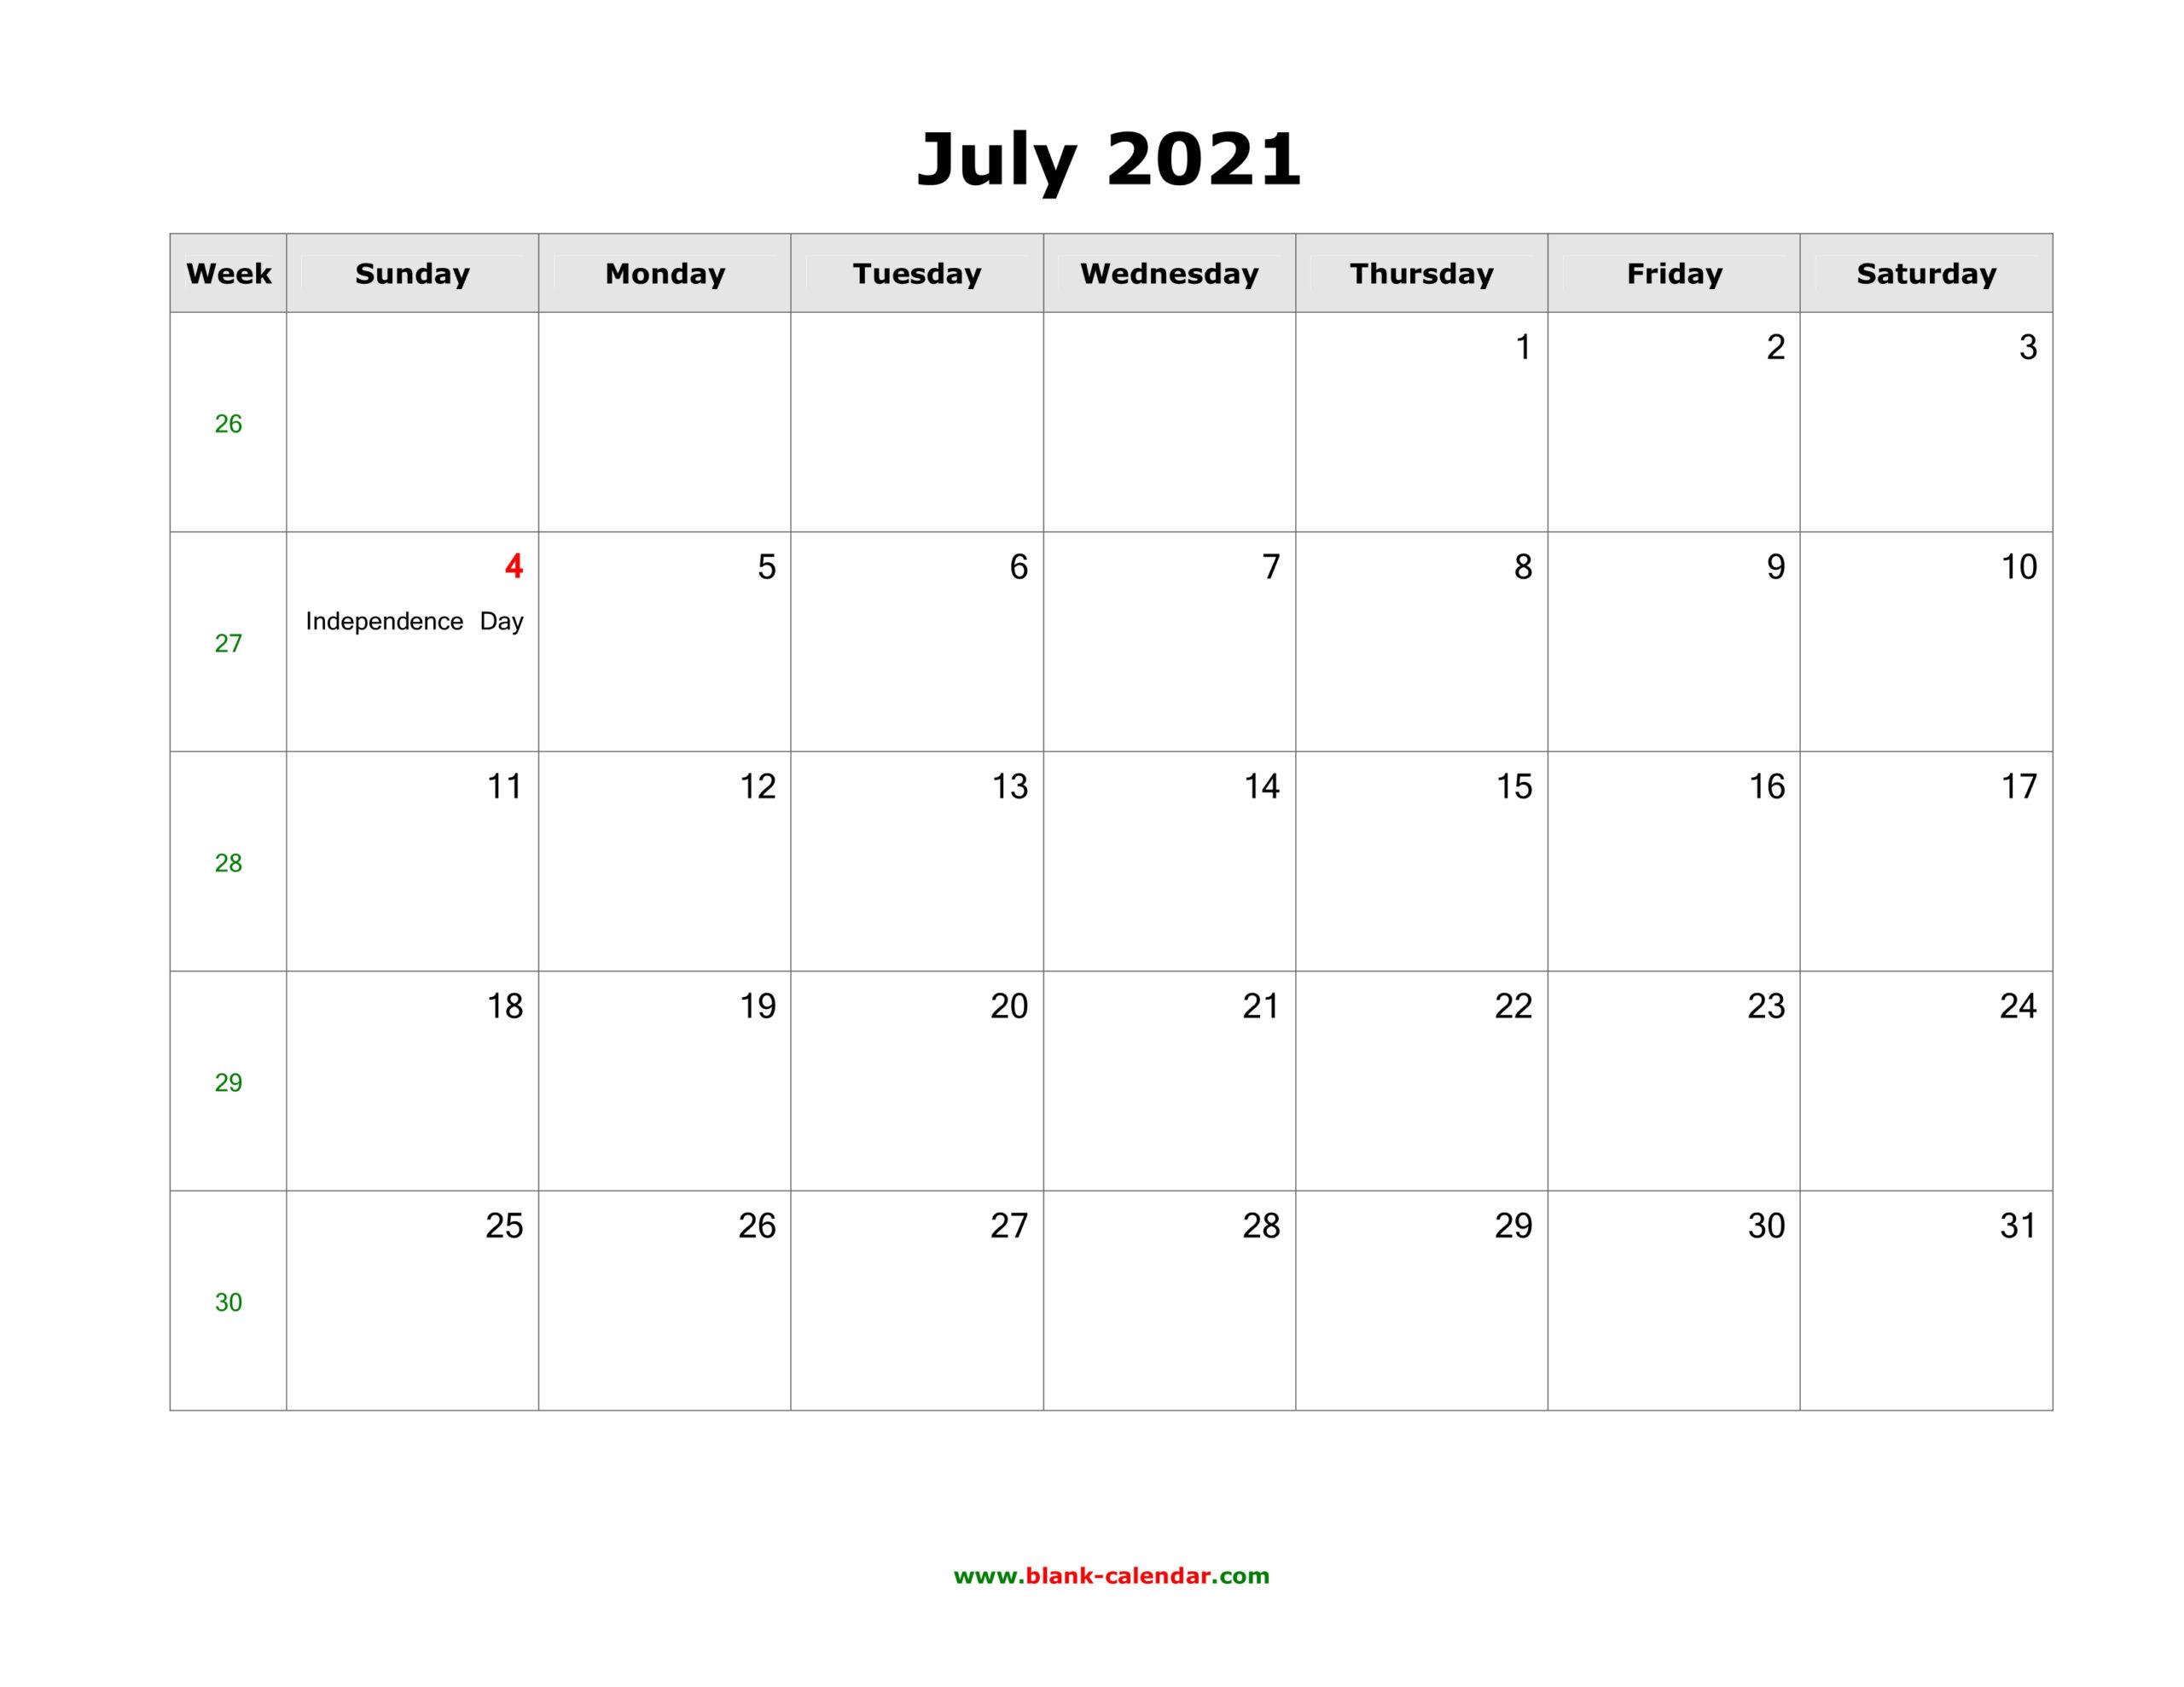 July 2021 Blank Calendar   Free Download Calendar Templates